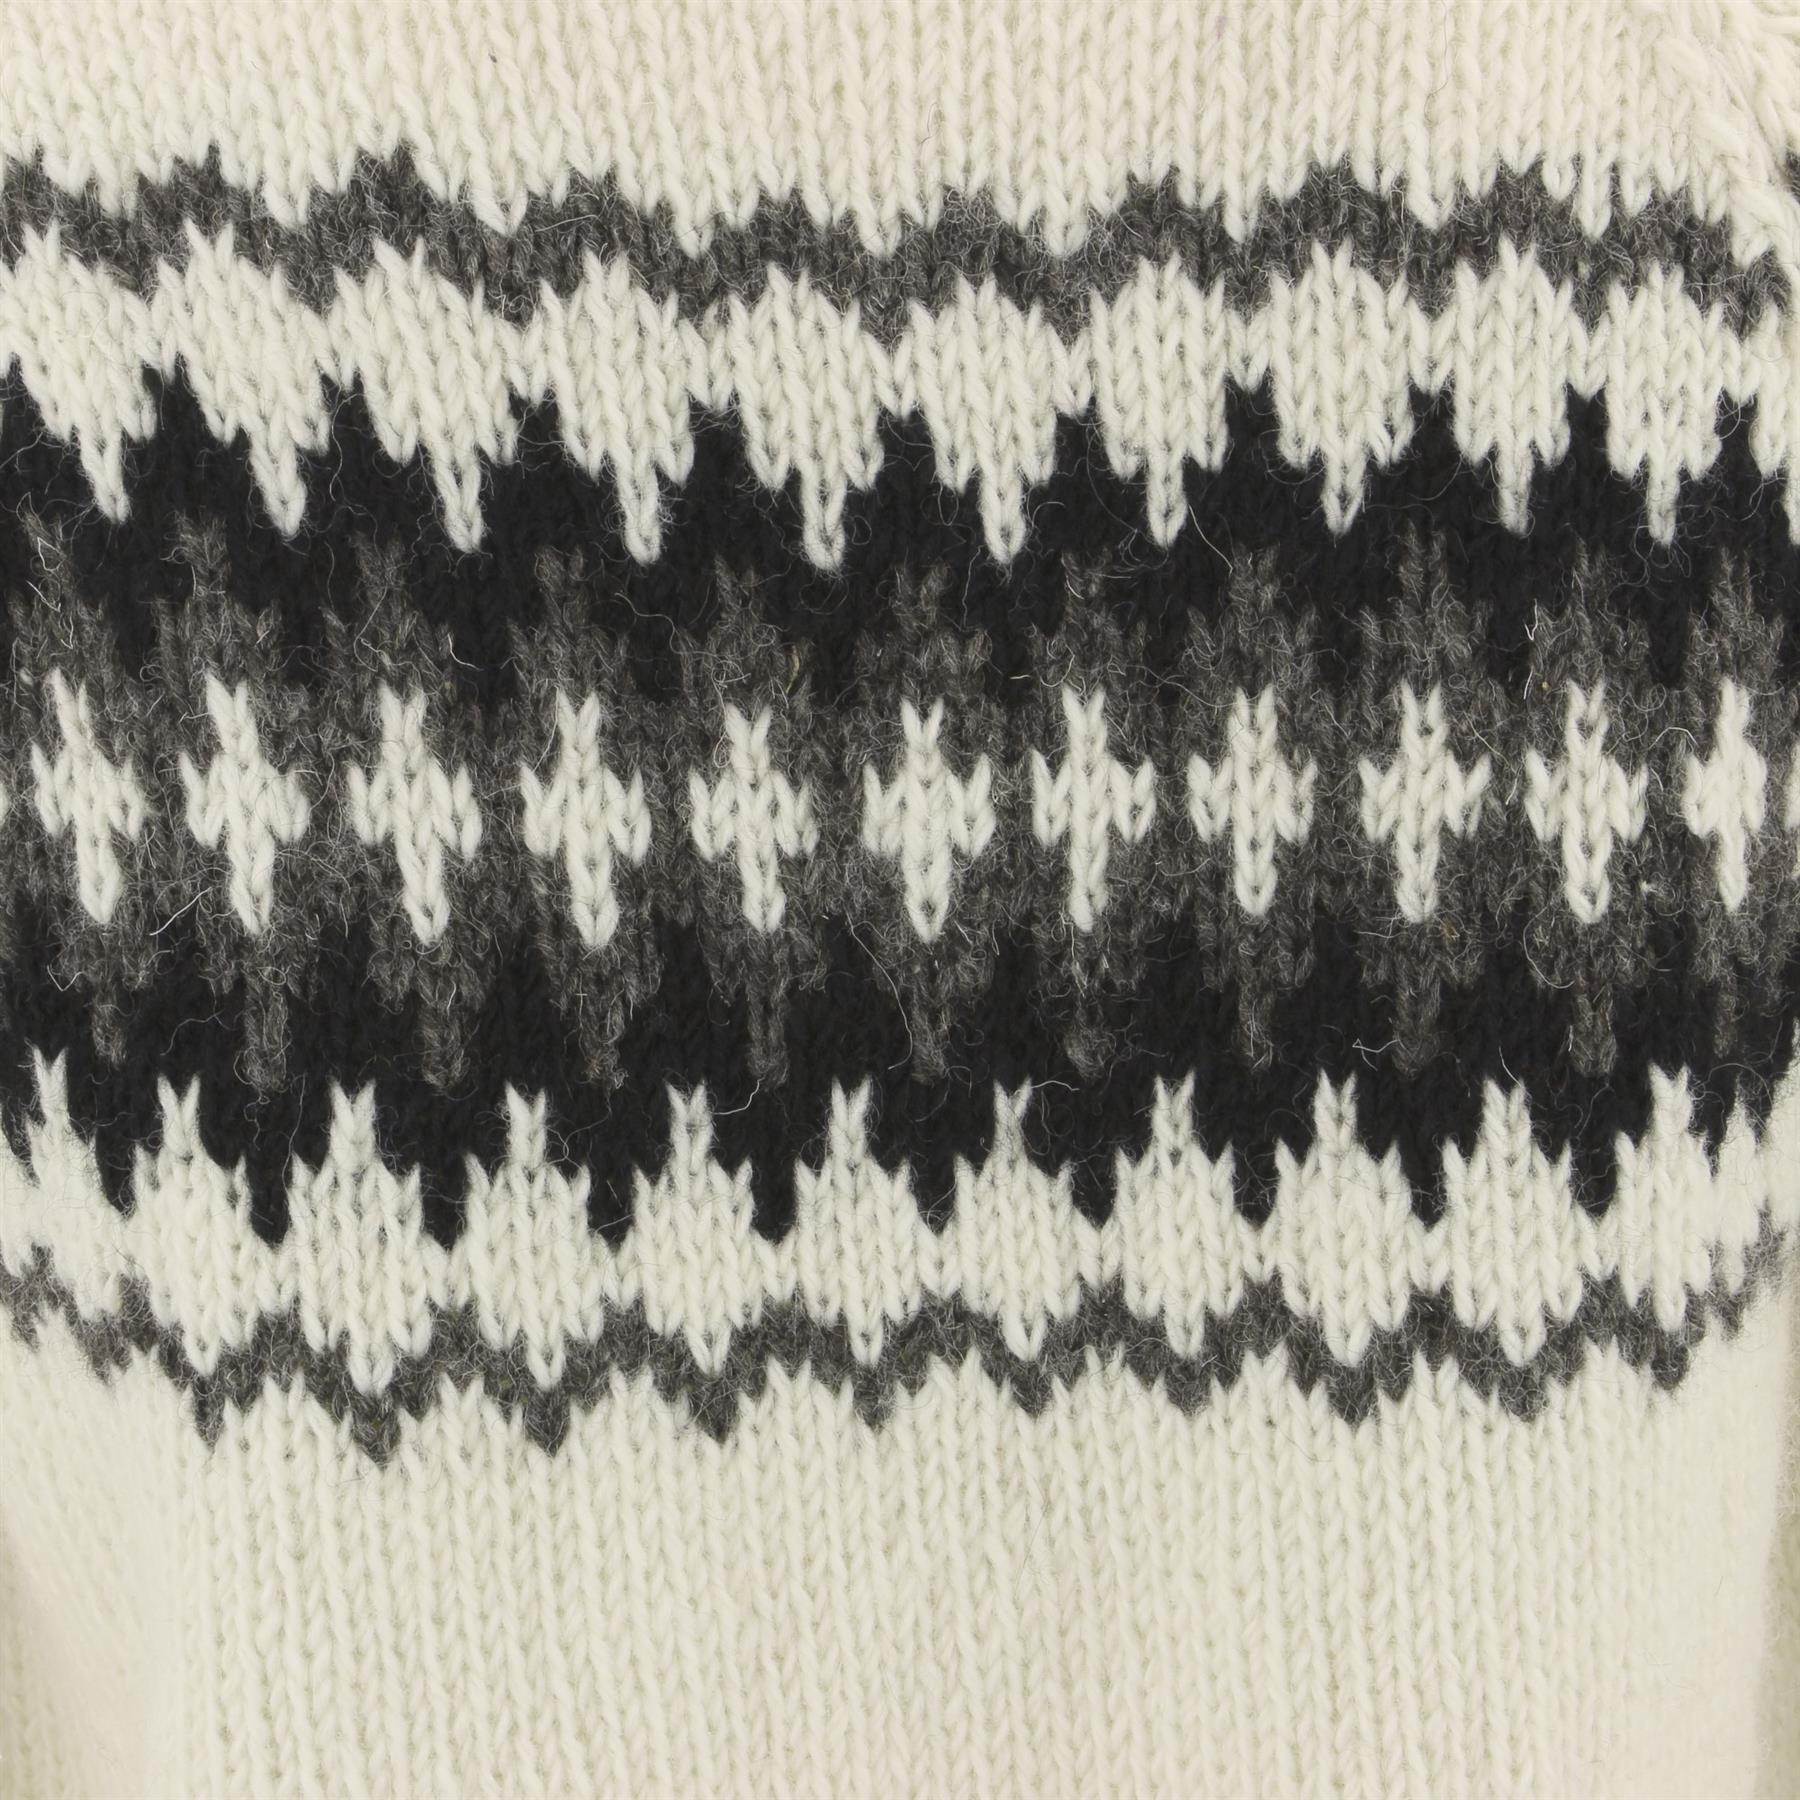 thumbnail 26 - Wool Knit Jumper Sweater Pullover Fairisle Nordic Abstract Warm Nepal Loose